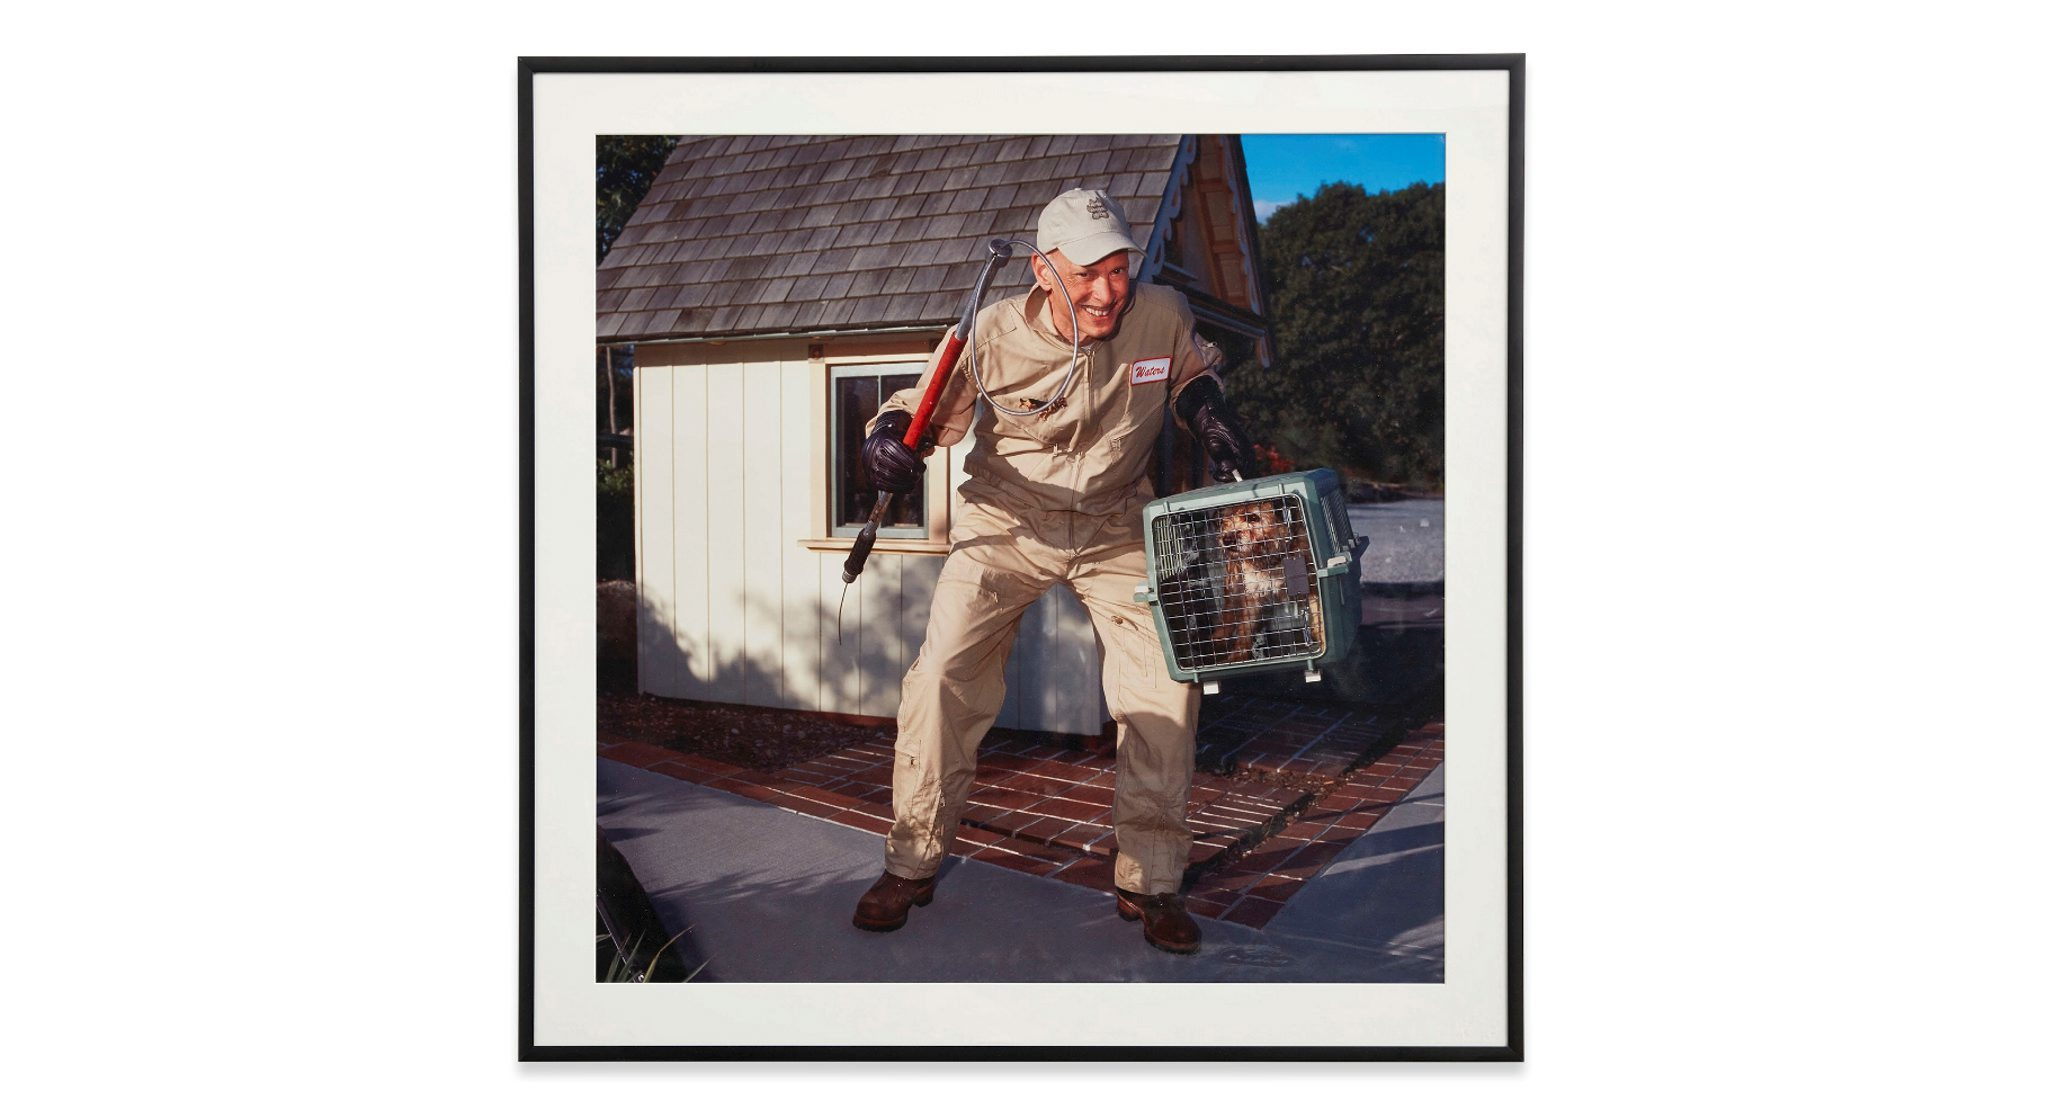 'Self Portrait #5 (Dog Catcher)', 2012